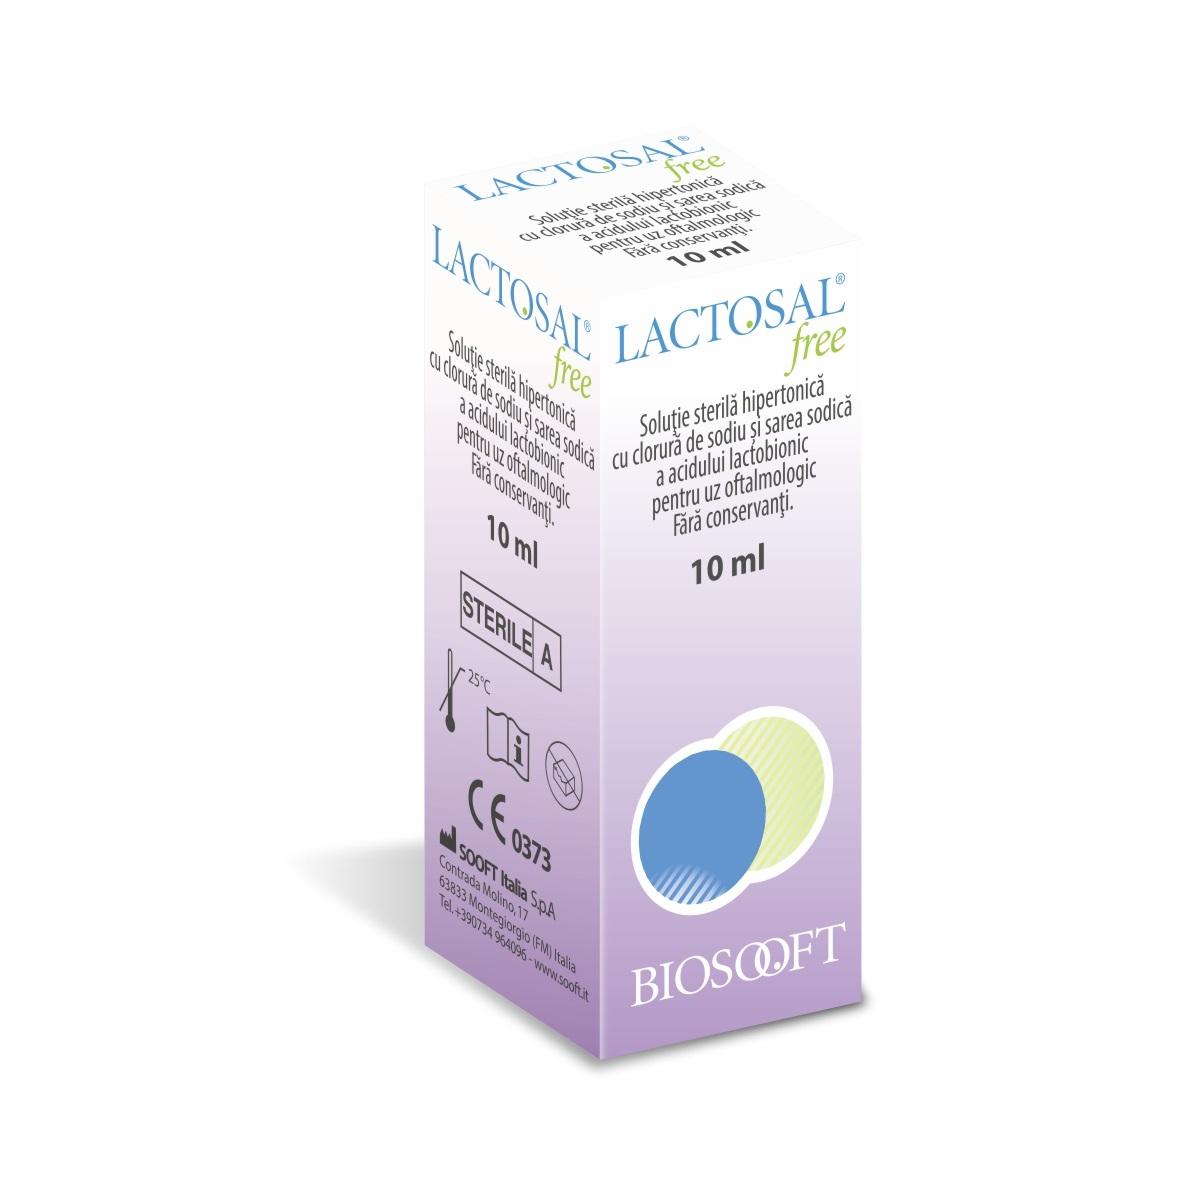 Lactosal free, 10 ml, Biosooft